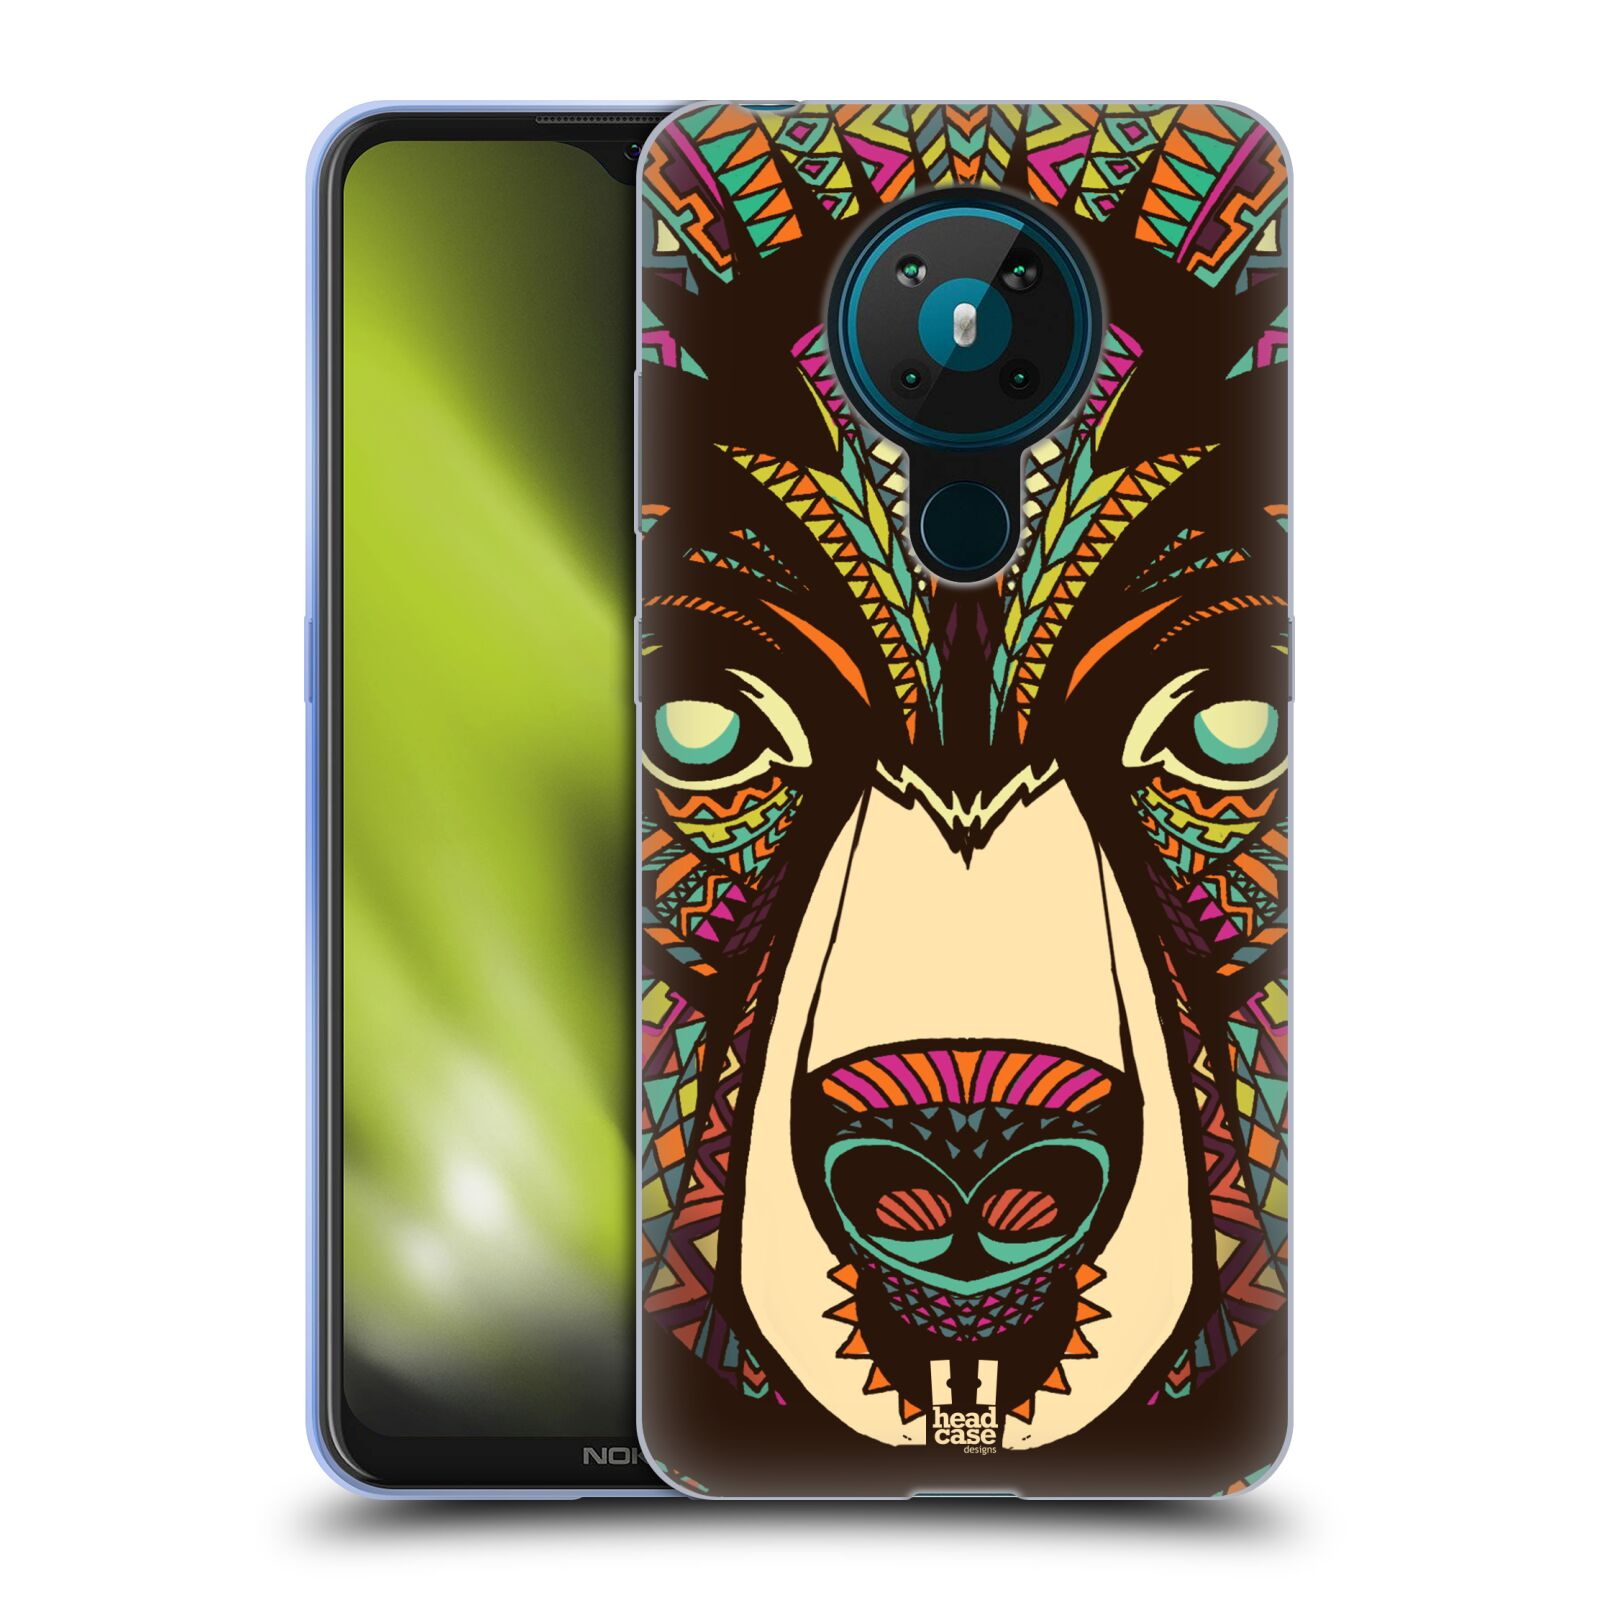 Silikonové pouzdro na mobil Nokia 5.3 - Head Case - AZTEC MEDVĚD